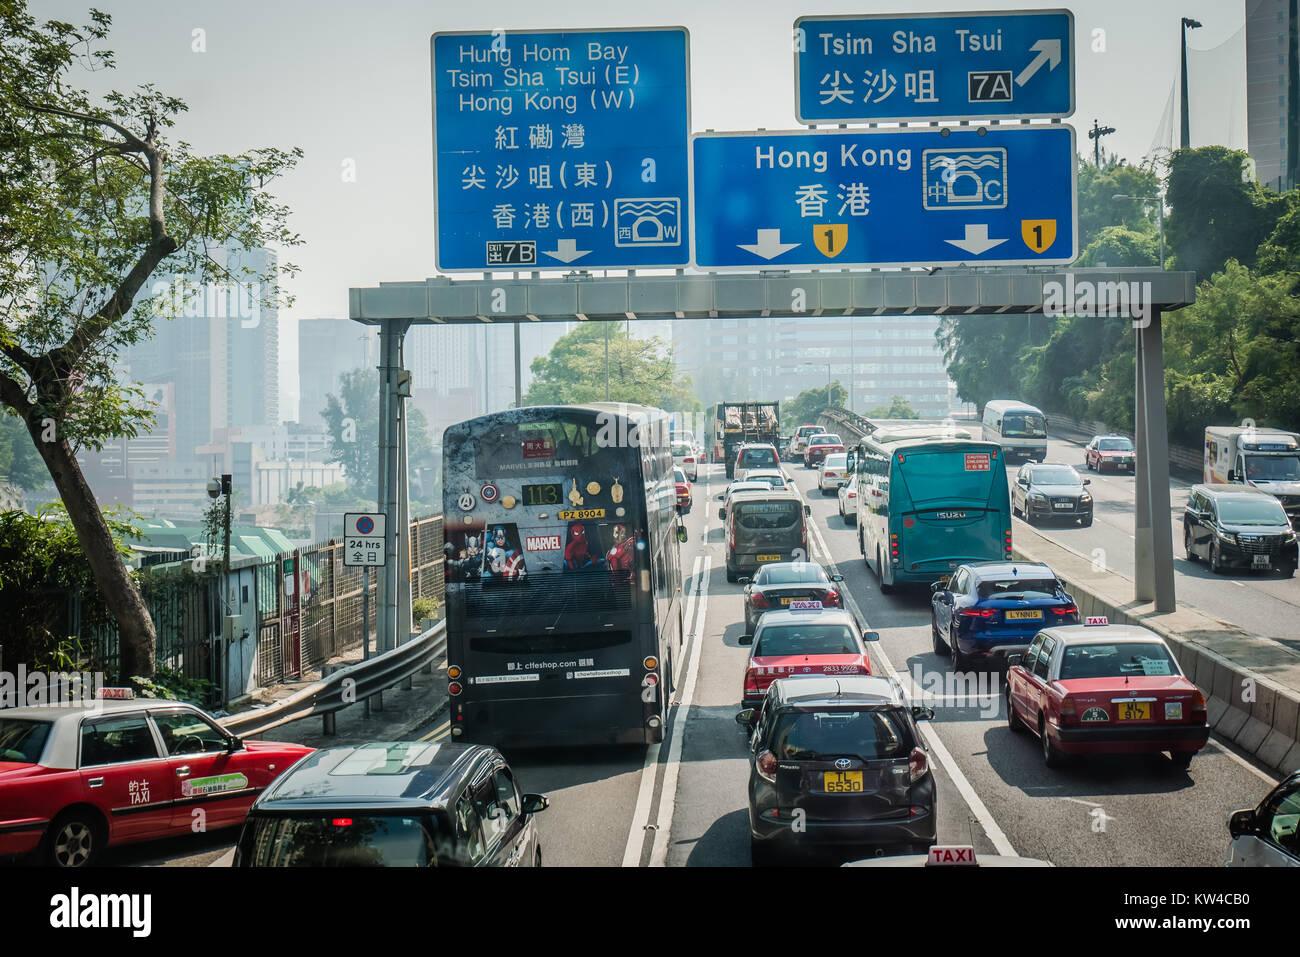 hong kong traffic congestion - Stock Image